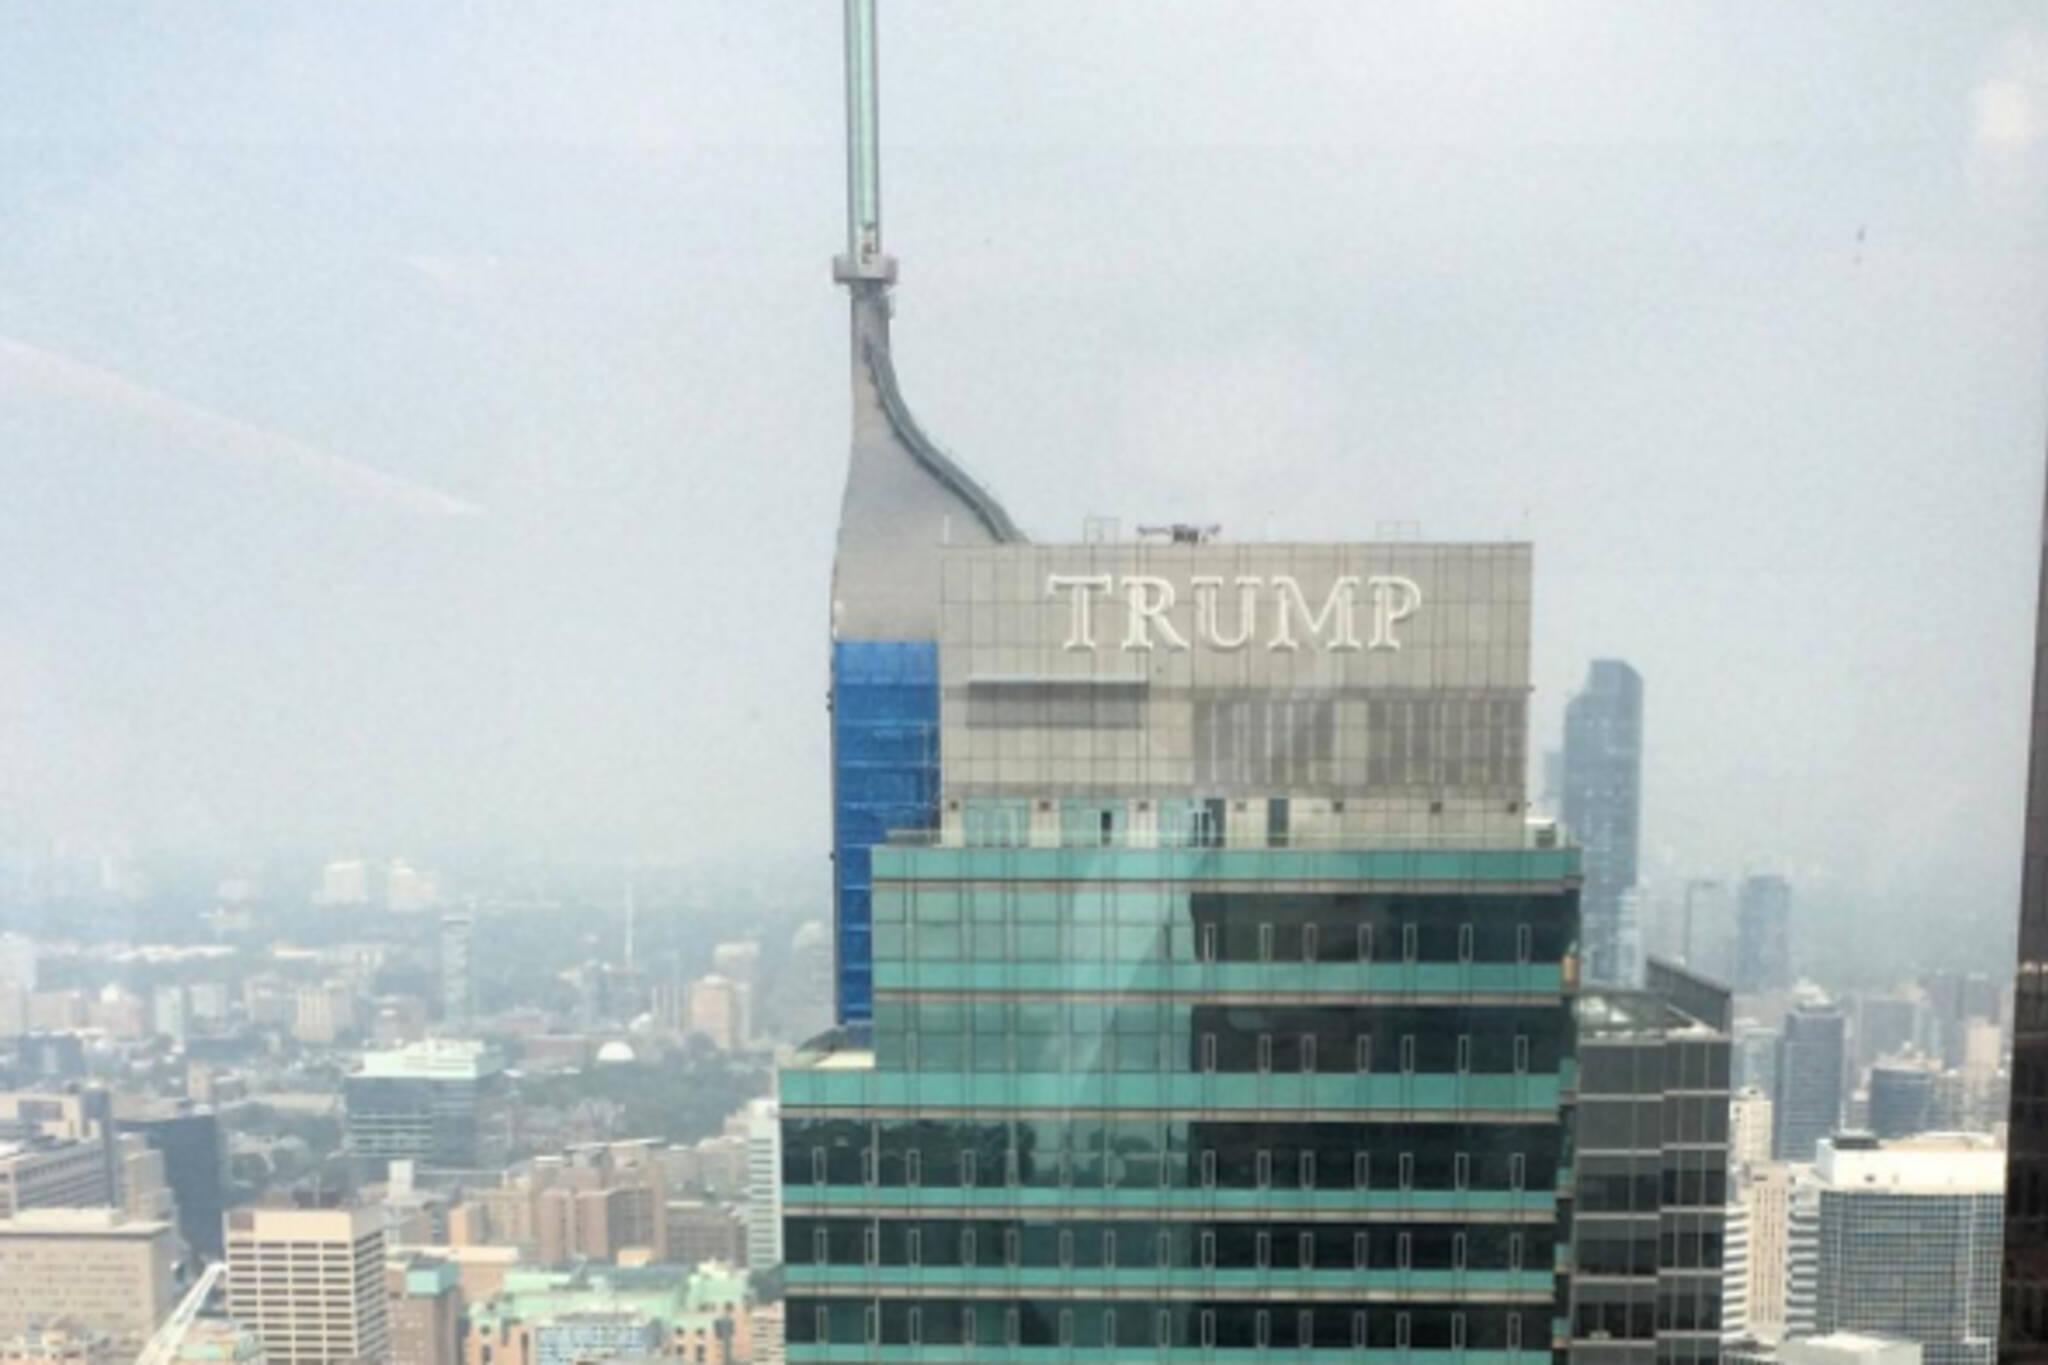 Trump Hotel And Tower Toronto